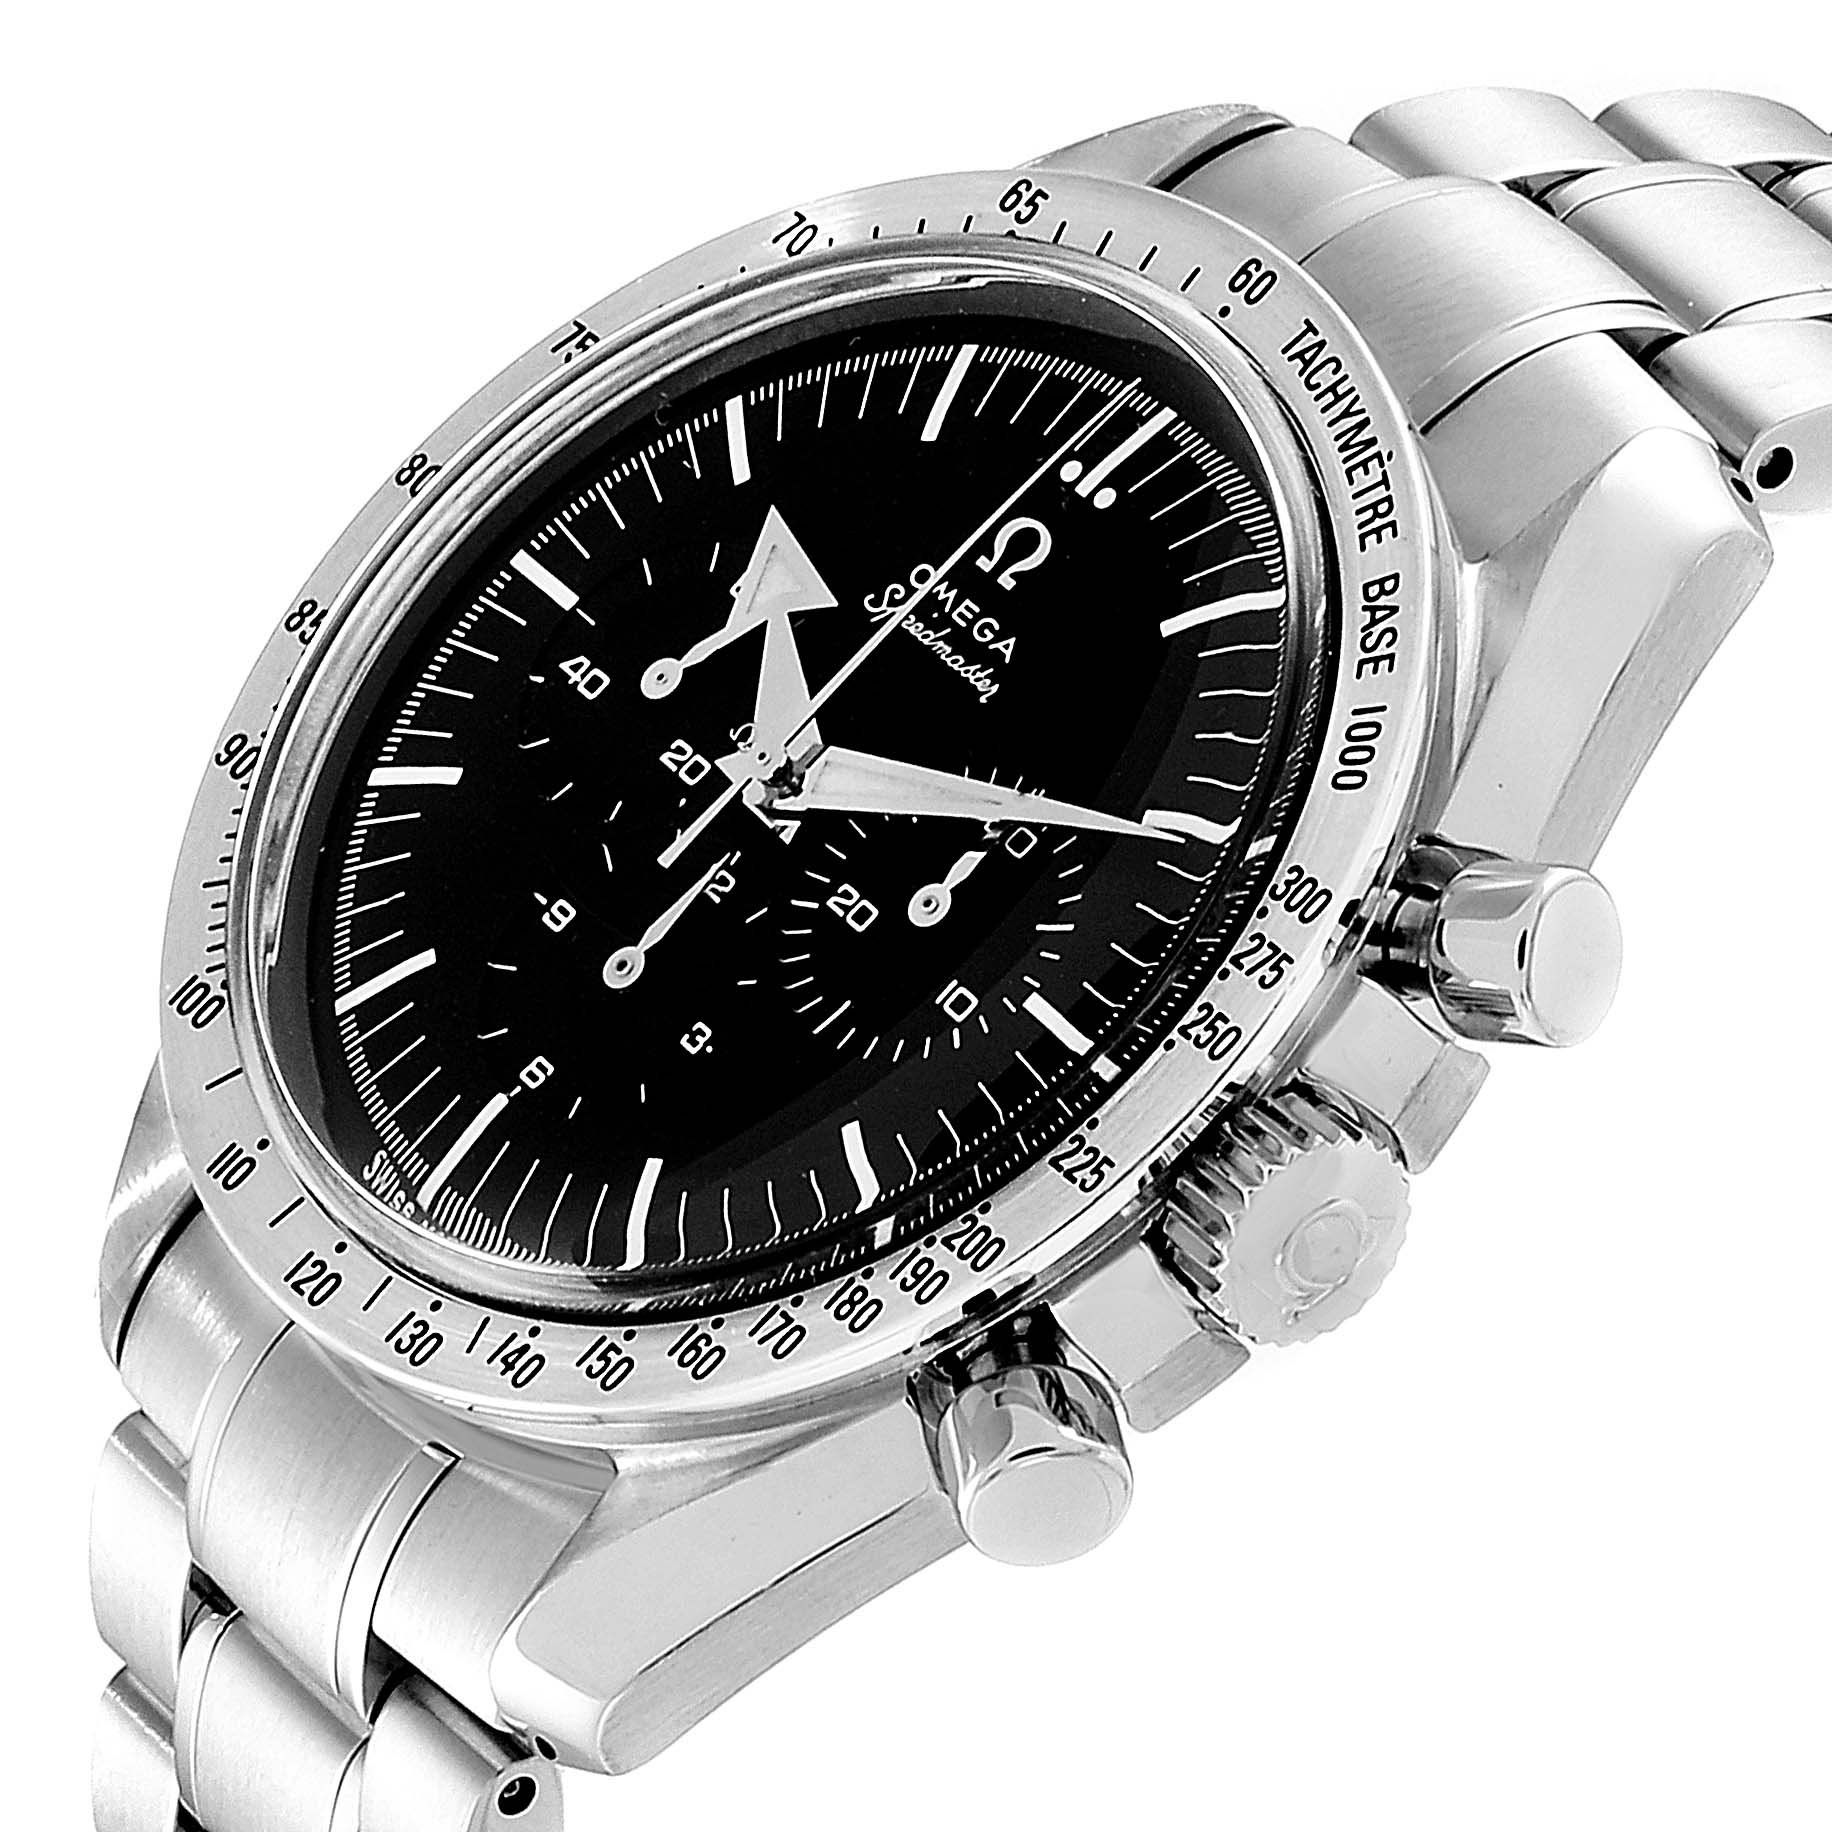 Omega Speedmaster Broad Arrow GMT Mens Watch 3594.50.00 SwissWatchExpo